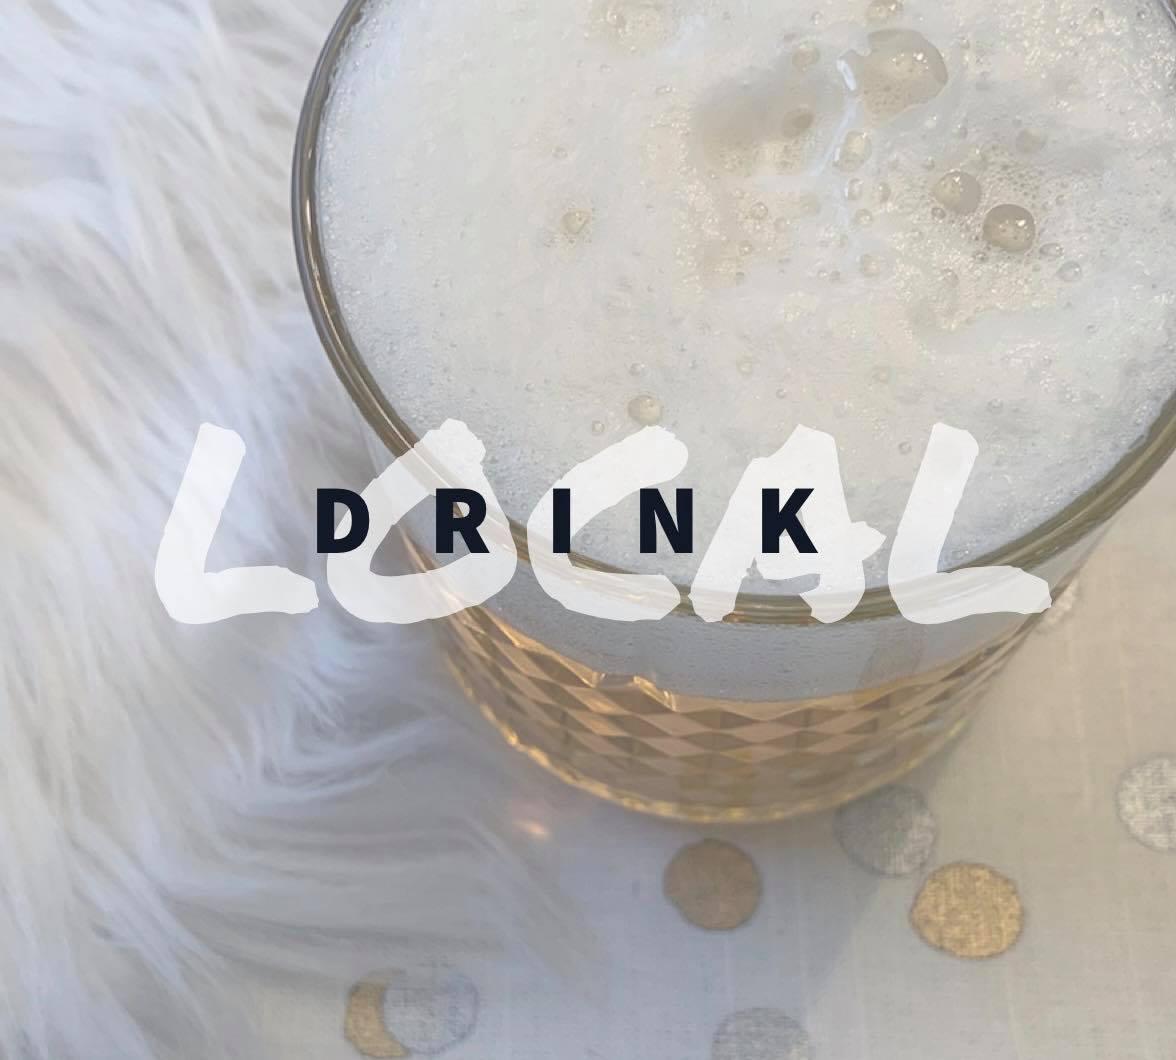 drinklocal-2.jpg